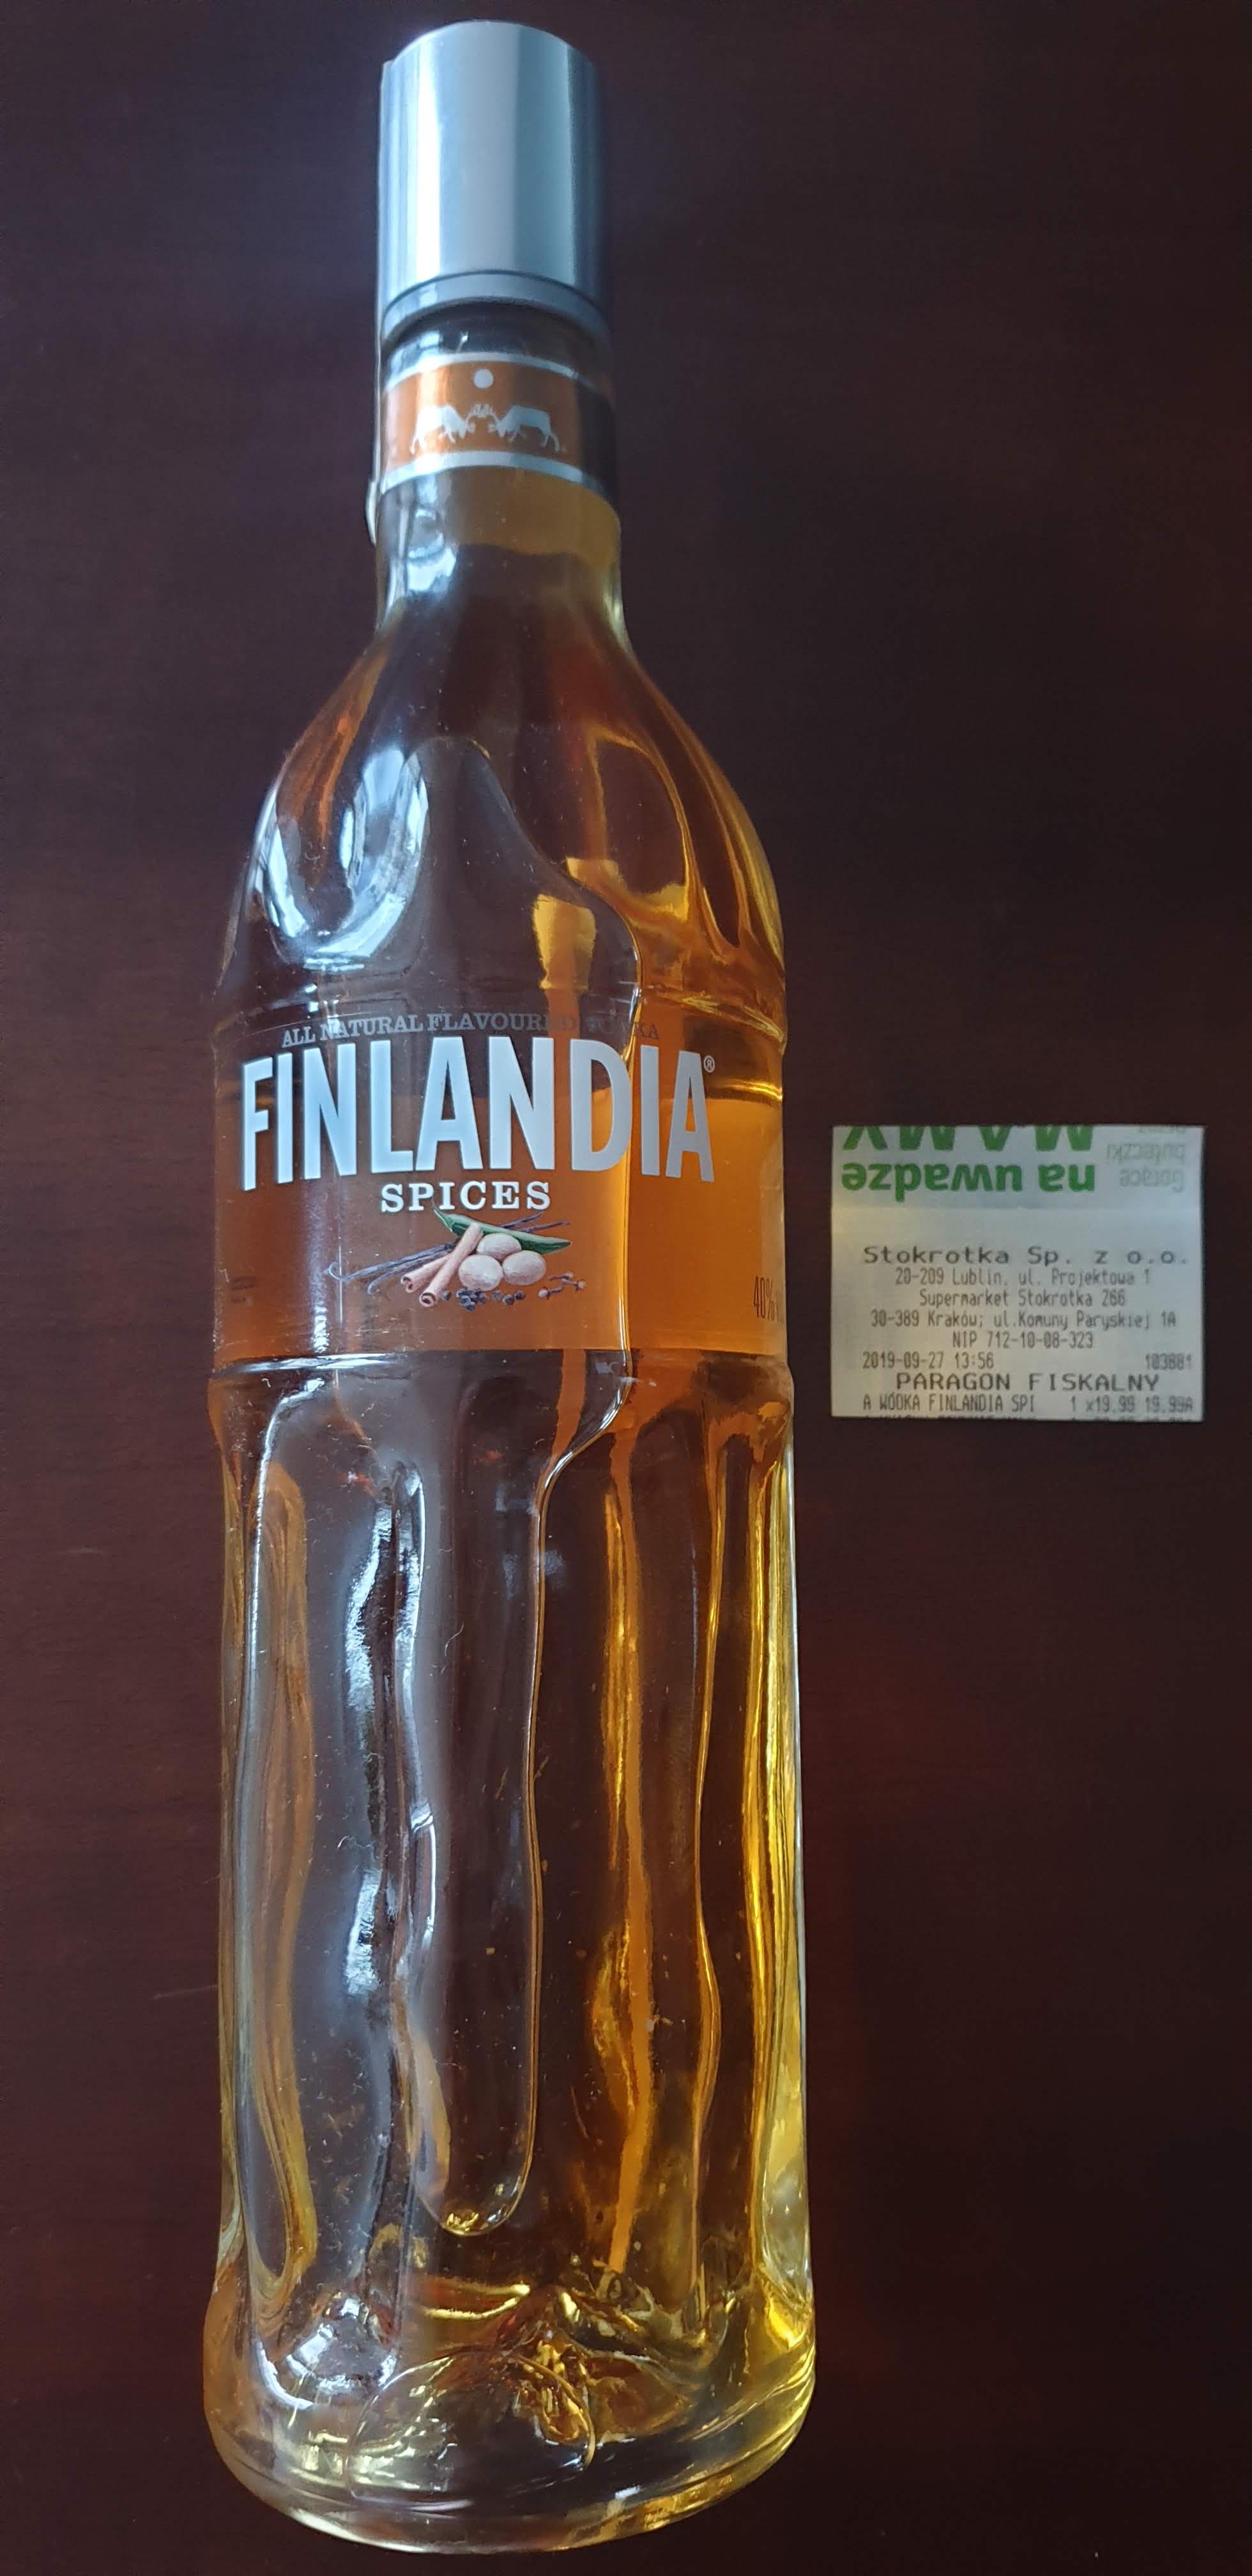 Finlandia Spices 0,7l 40% - Stokrotka